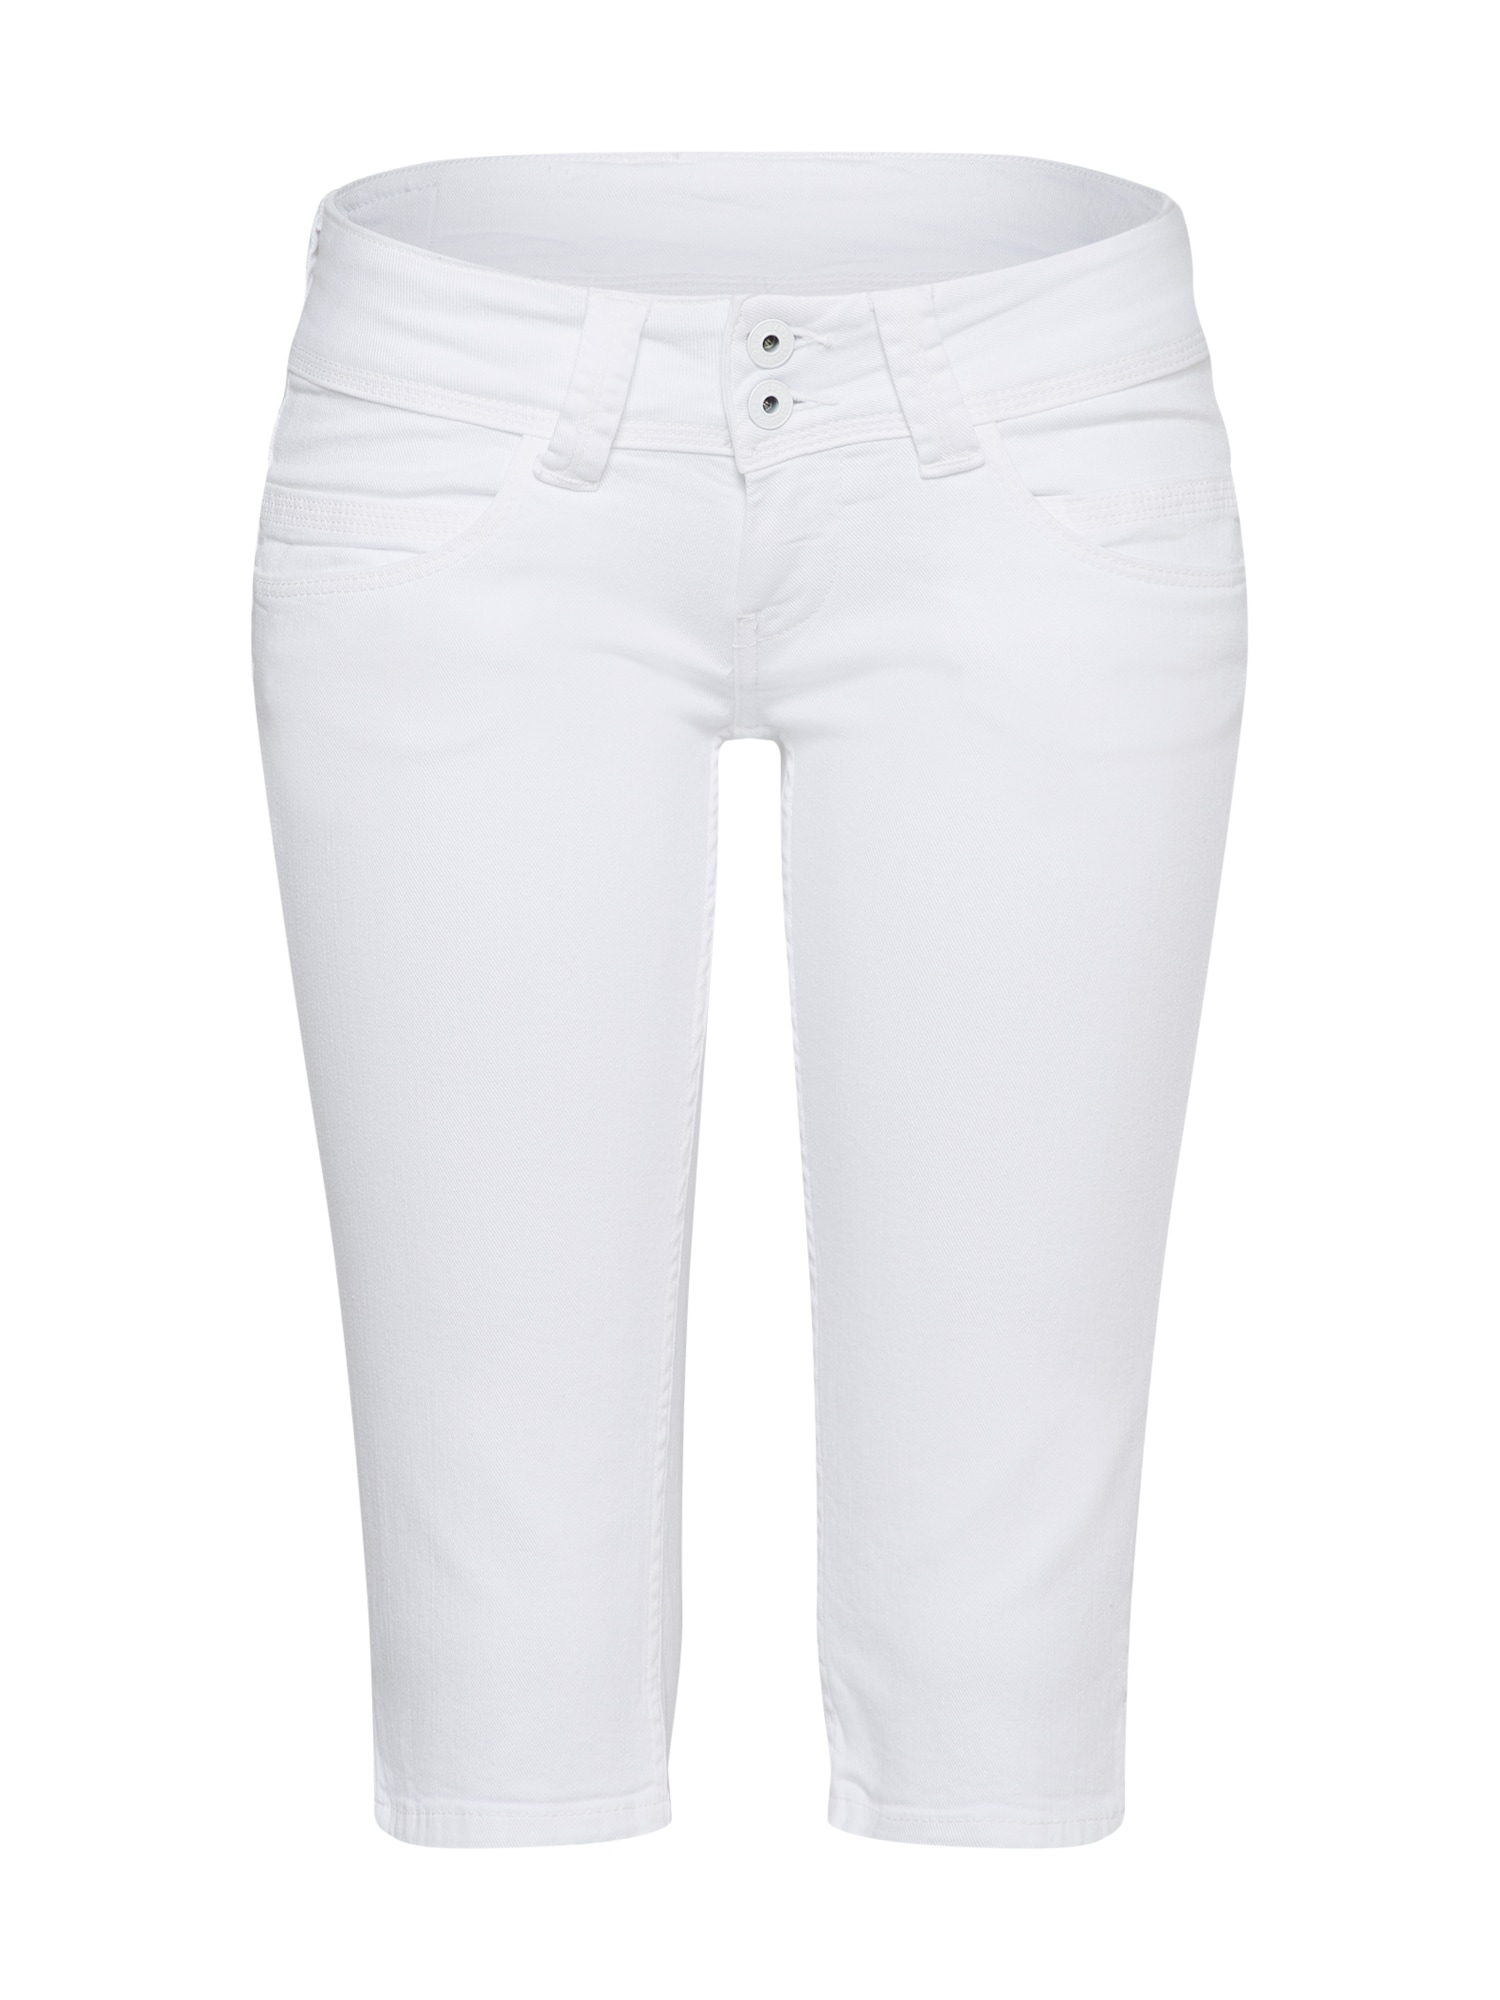 Bleached Caprijeans 'Venus' | Bekleidung > Jeans > Caprijeans | Pepe Jeans